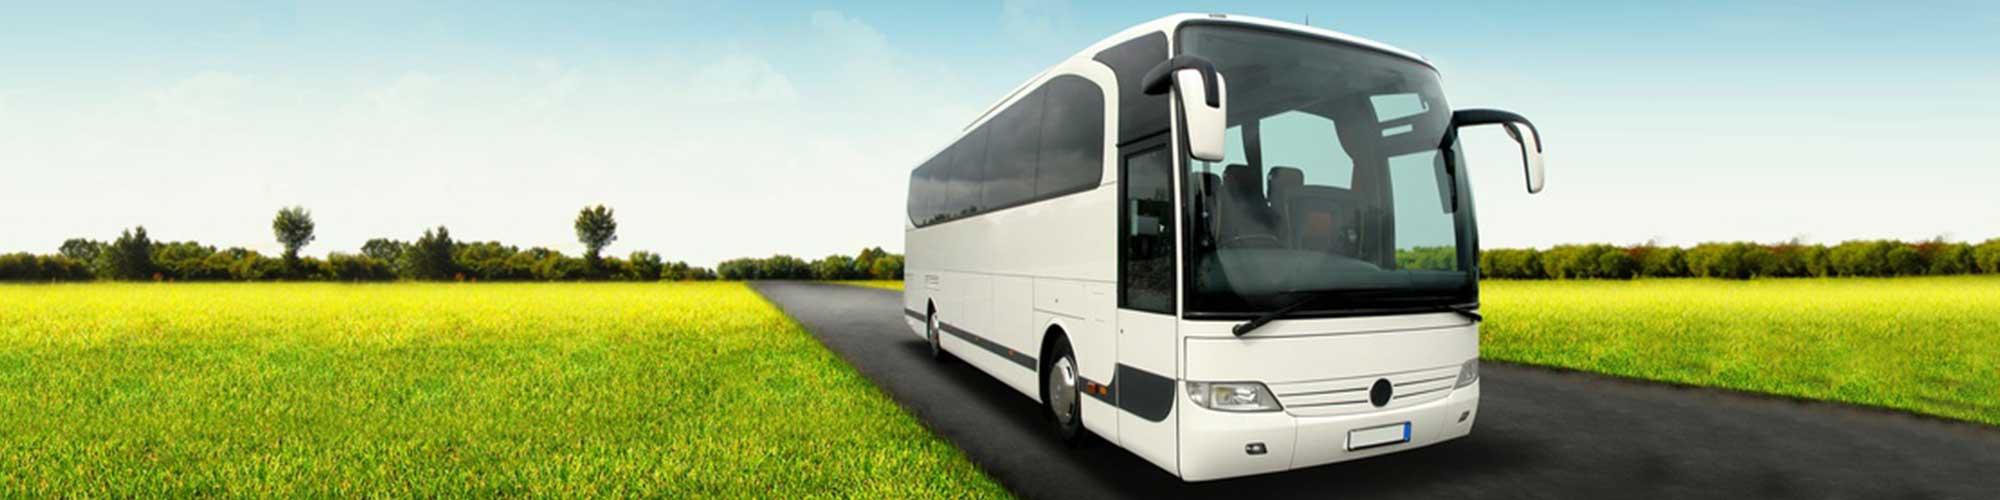 AutobusseMercedes